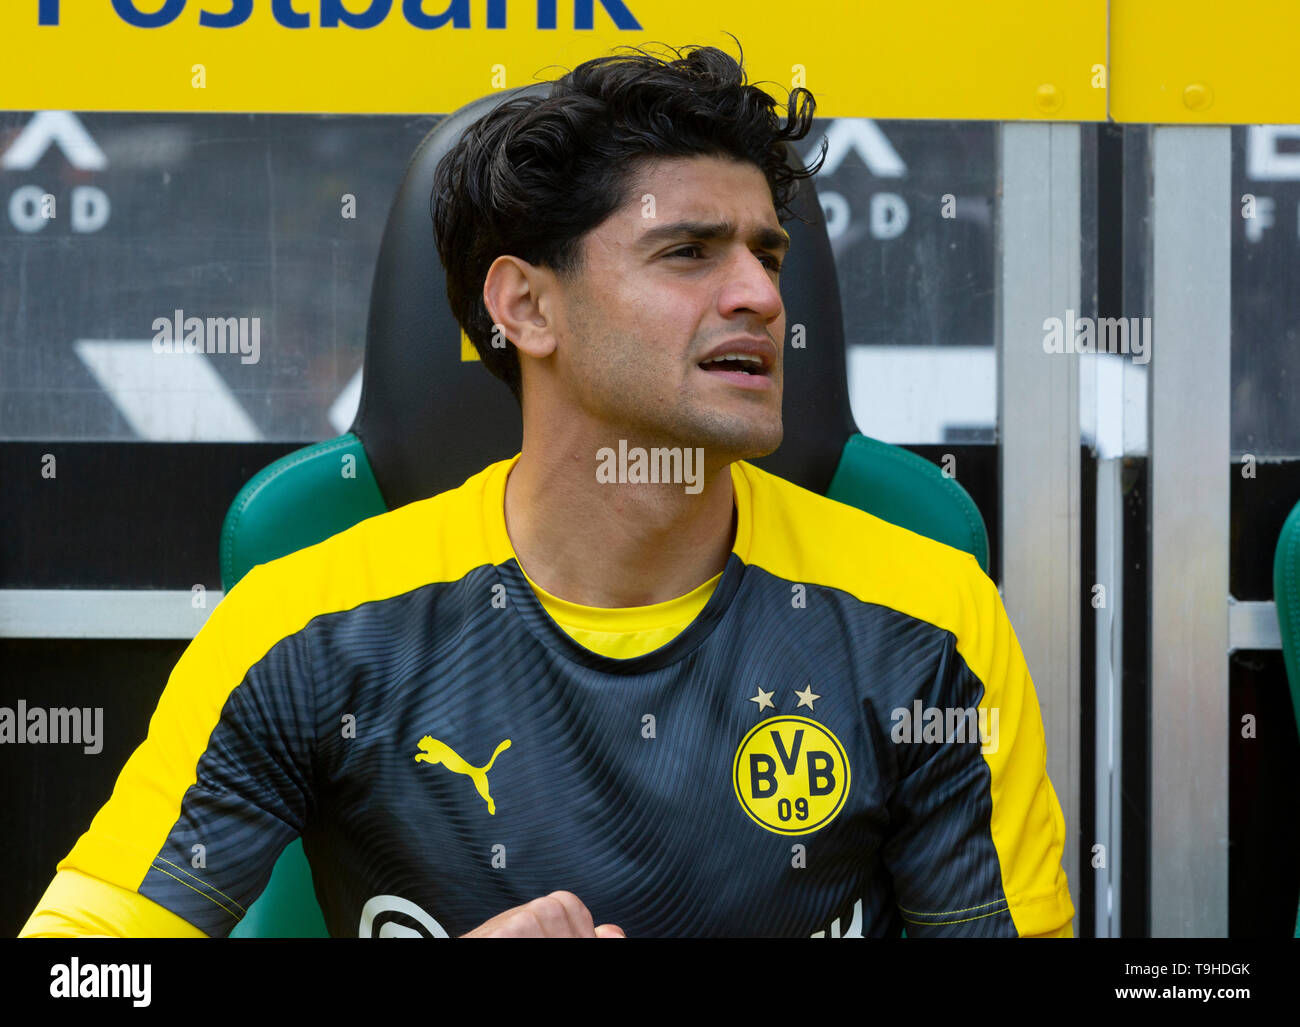 sports, football, Bundesliga, 2018/2019, Borussia Moenchengladbach vs. BVB Borussia Dortmund 0-2, Stadium Borussia Park, players bench, Mahmoud Dahoud (BVB), DFL REGULATIONS PROHIBIT ANY USE OF PHOTOGRAPHS AS IMAGE SEQUENCES AND/OR QUASI-VIDEO - Stock Image